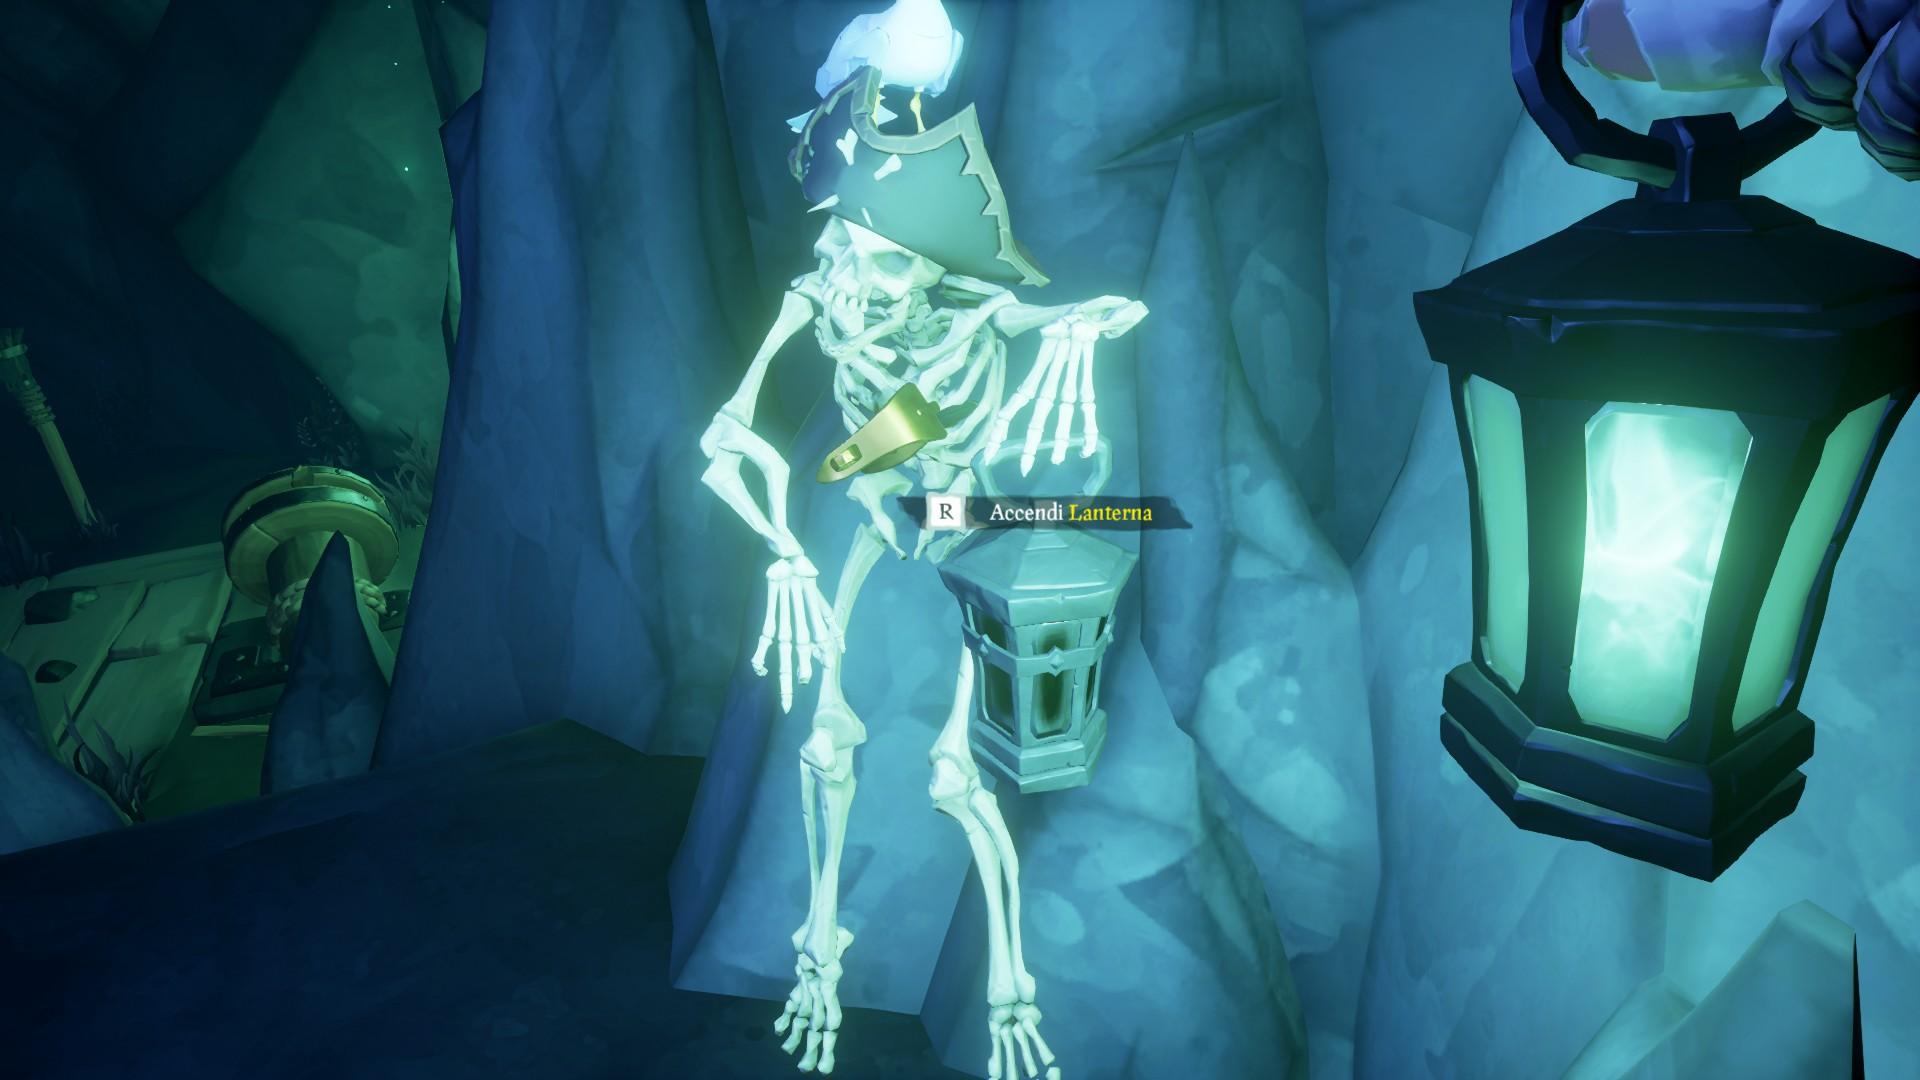 Vita da Pirata, accendere la lanterna.